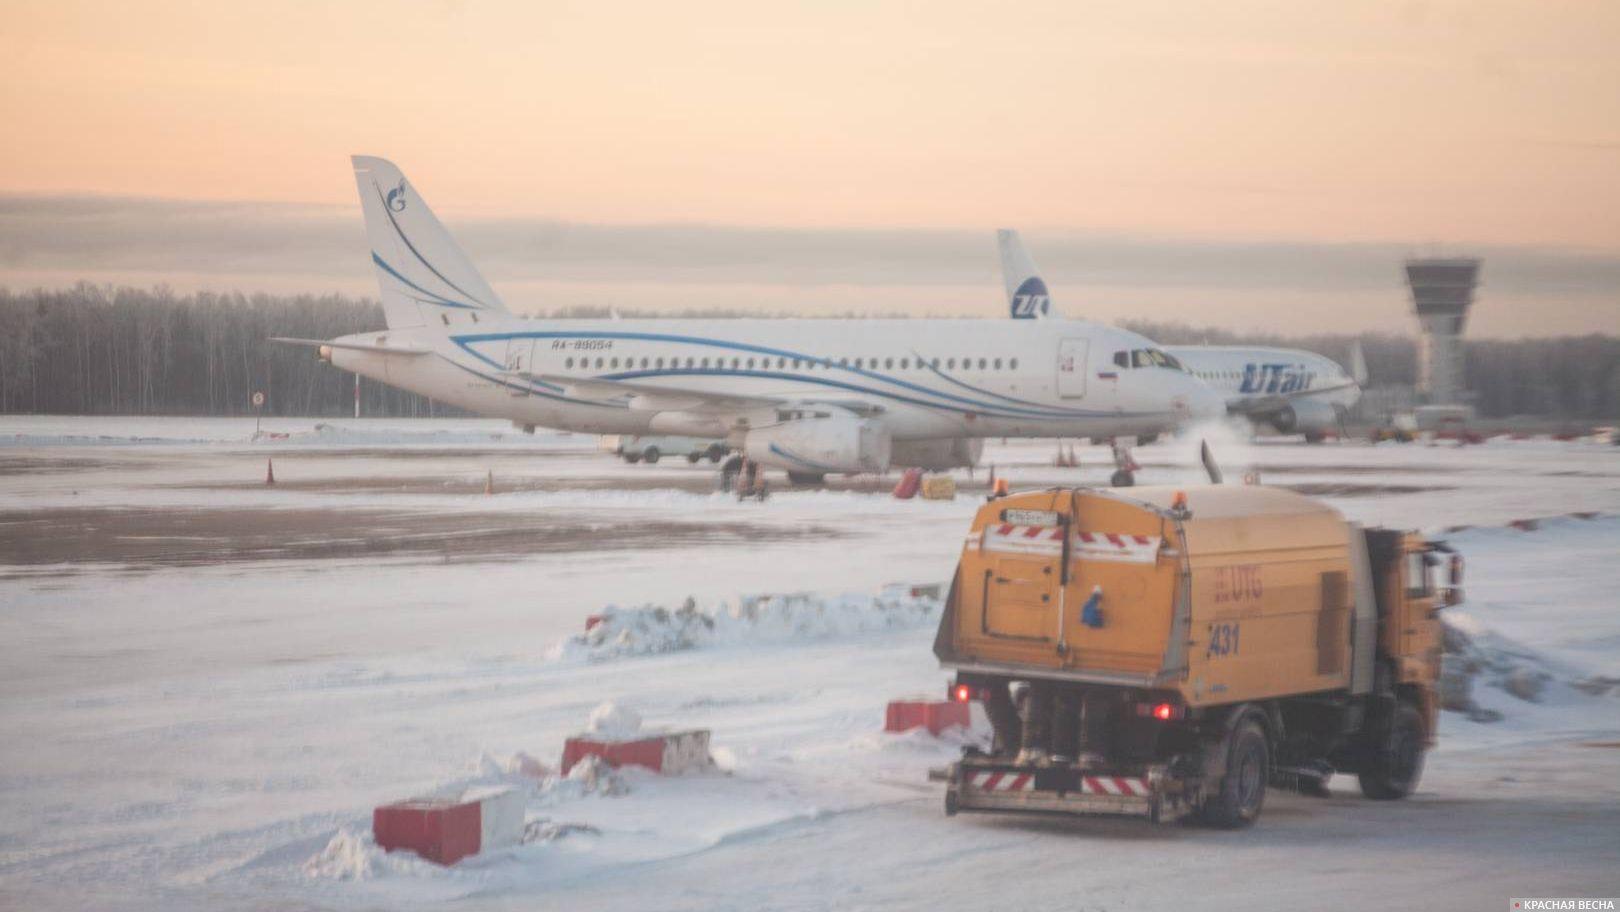 Сухой SuperJet 100-95LR в аэропорту Внуково, Москва